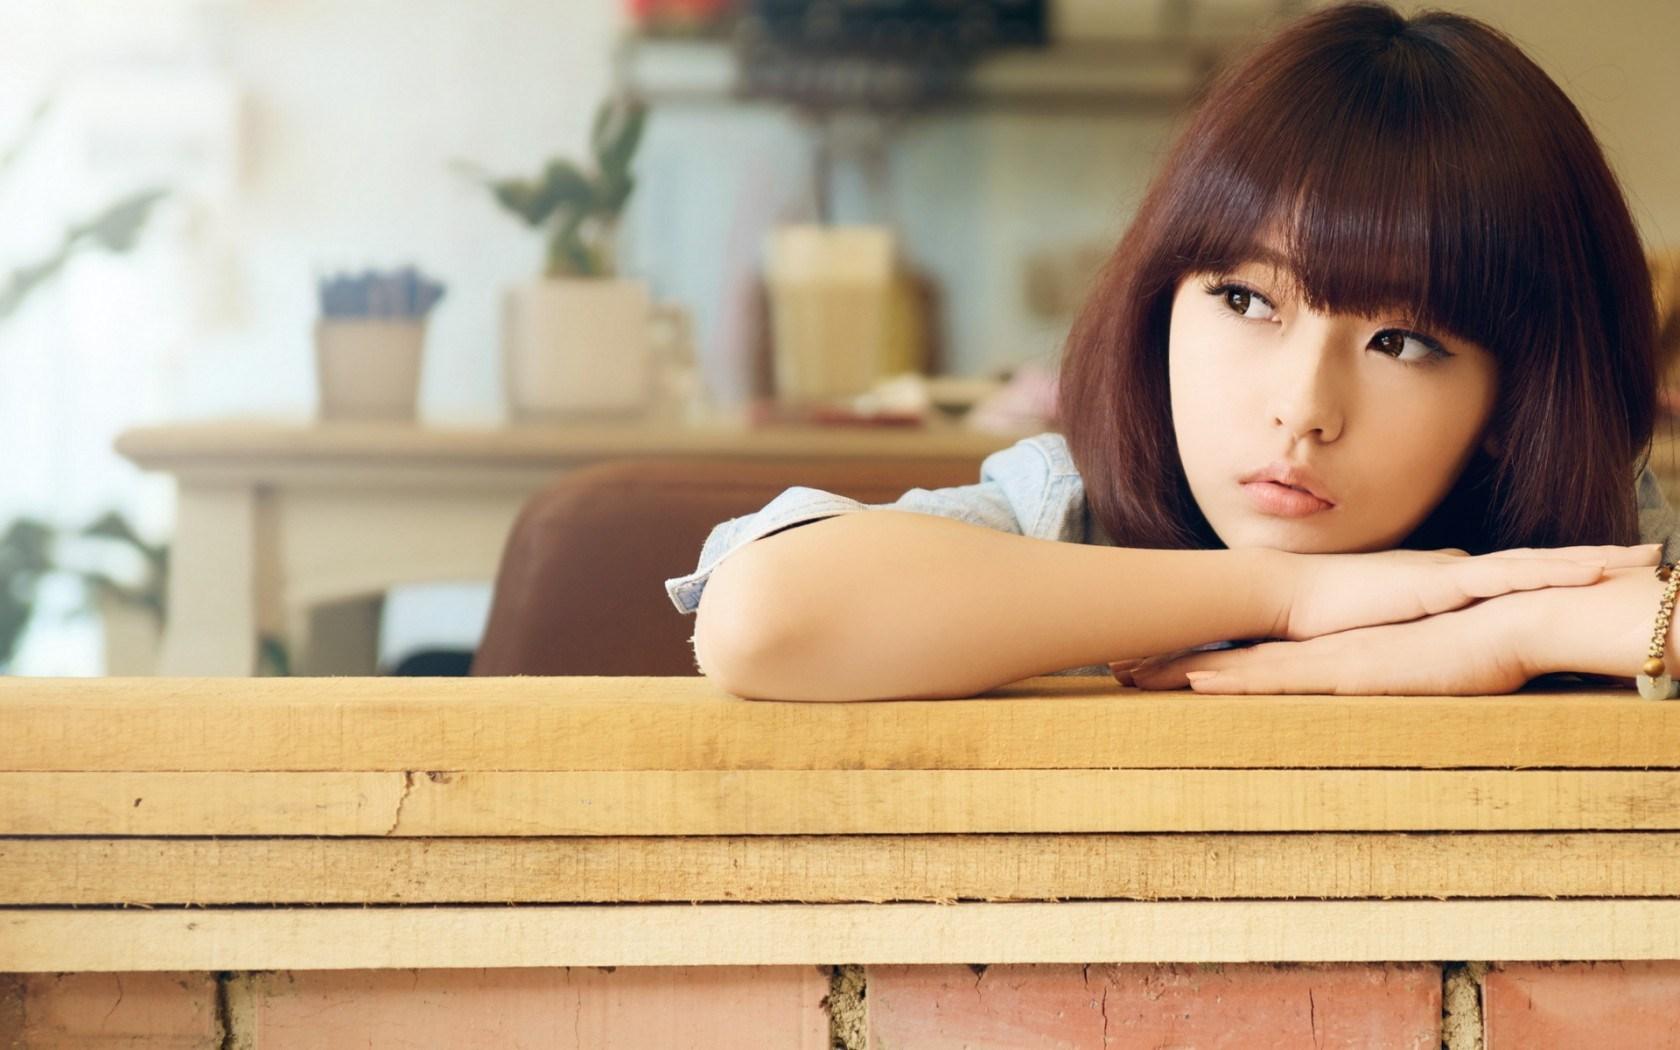 Asian Date Reviews Signs Of An Emotional Affair